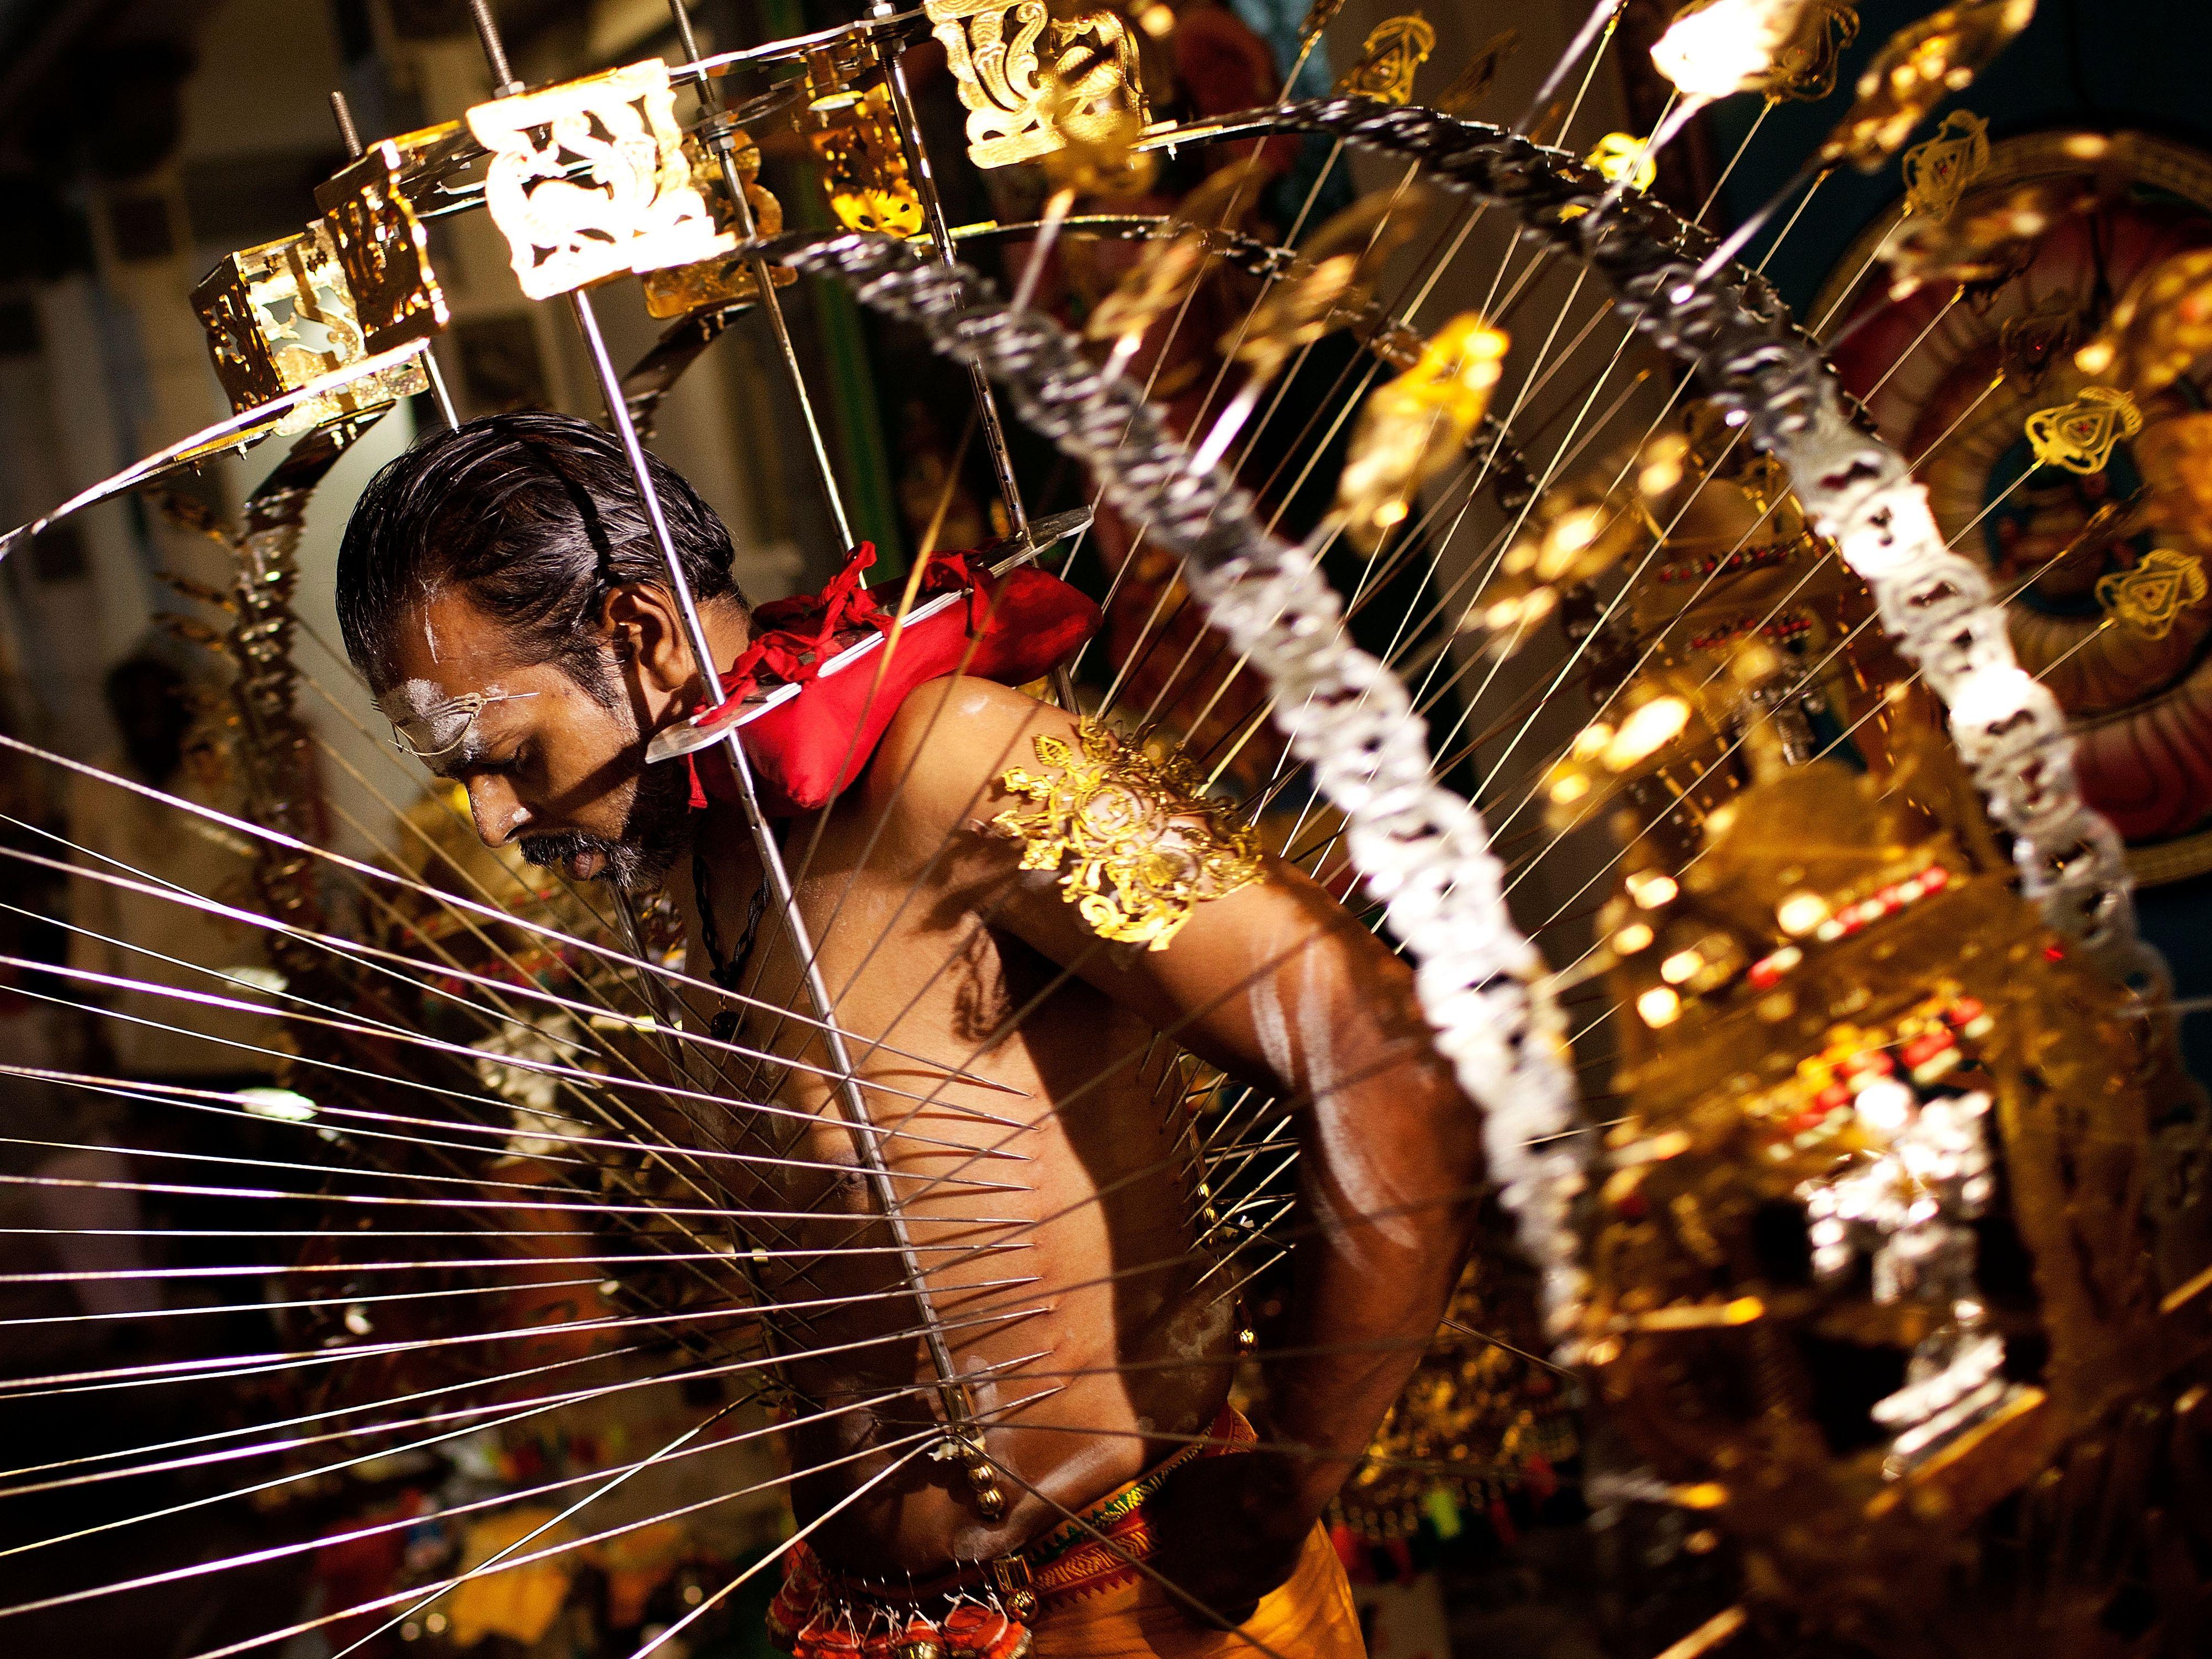 Thaipusam: Why Do People Pierce Their Bodies?